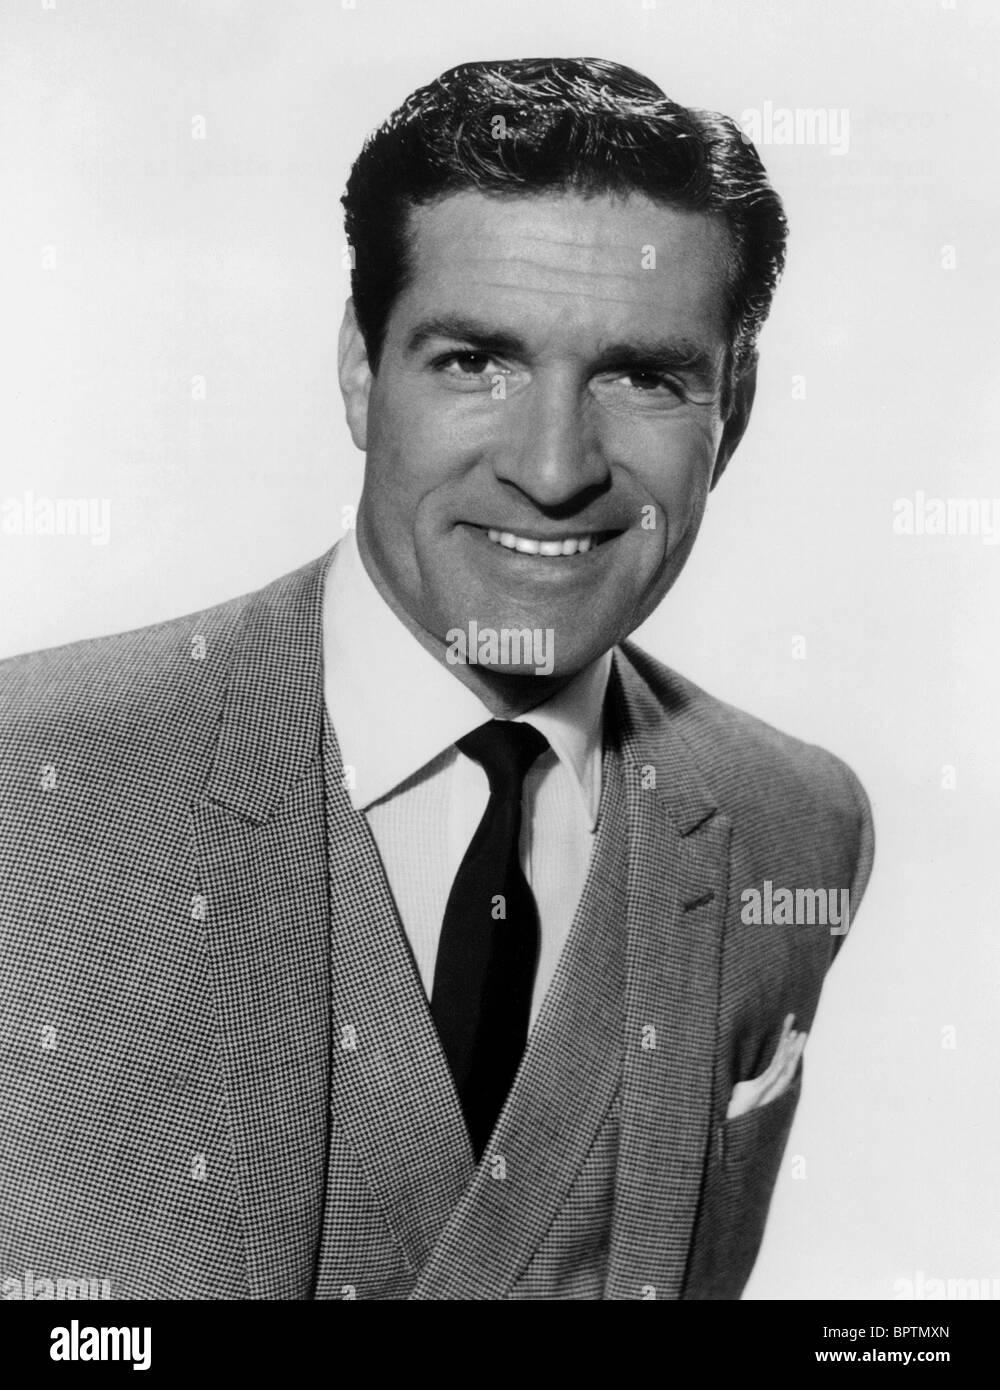 HUGH O'BRIAN ACTOR (1965) - Stock Image